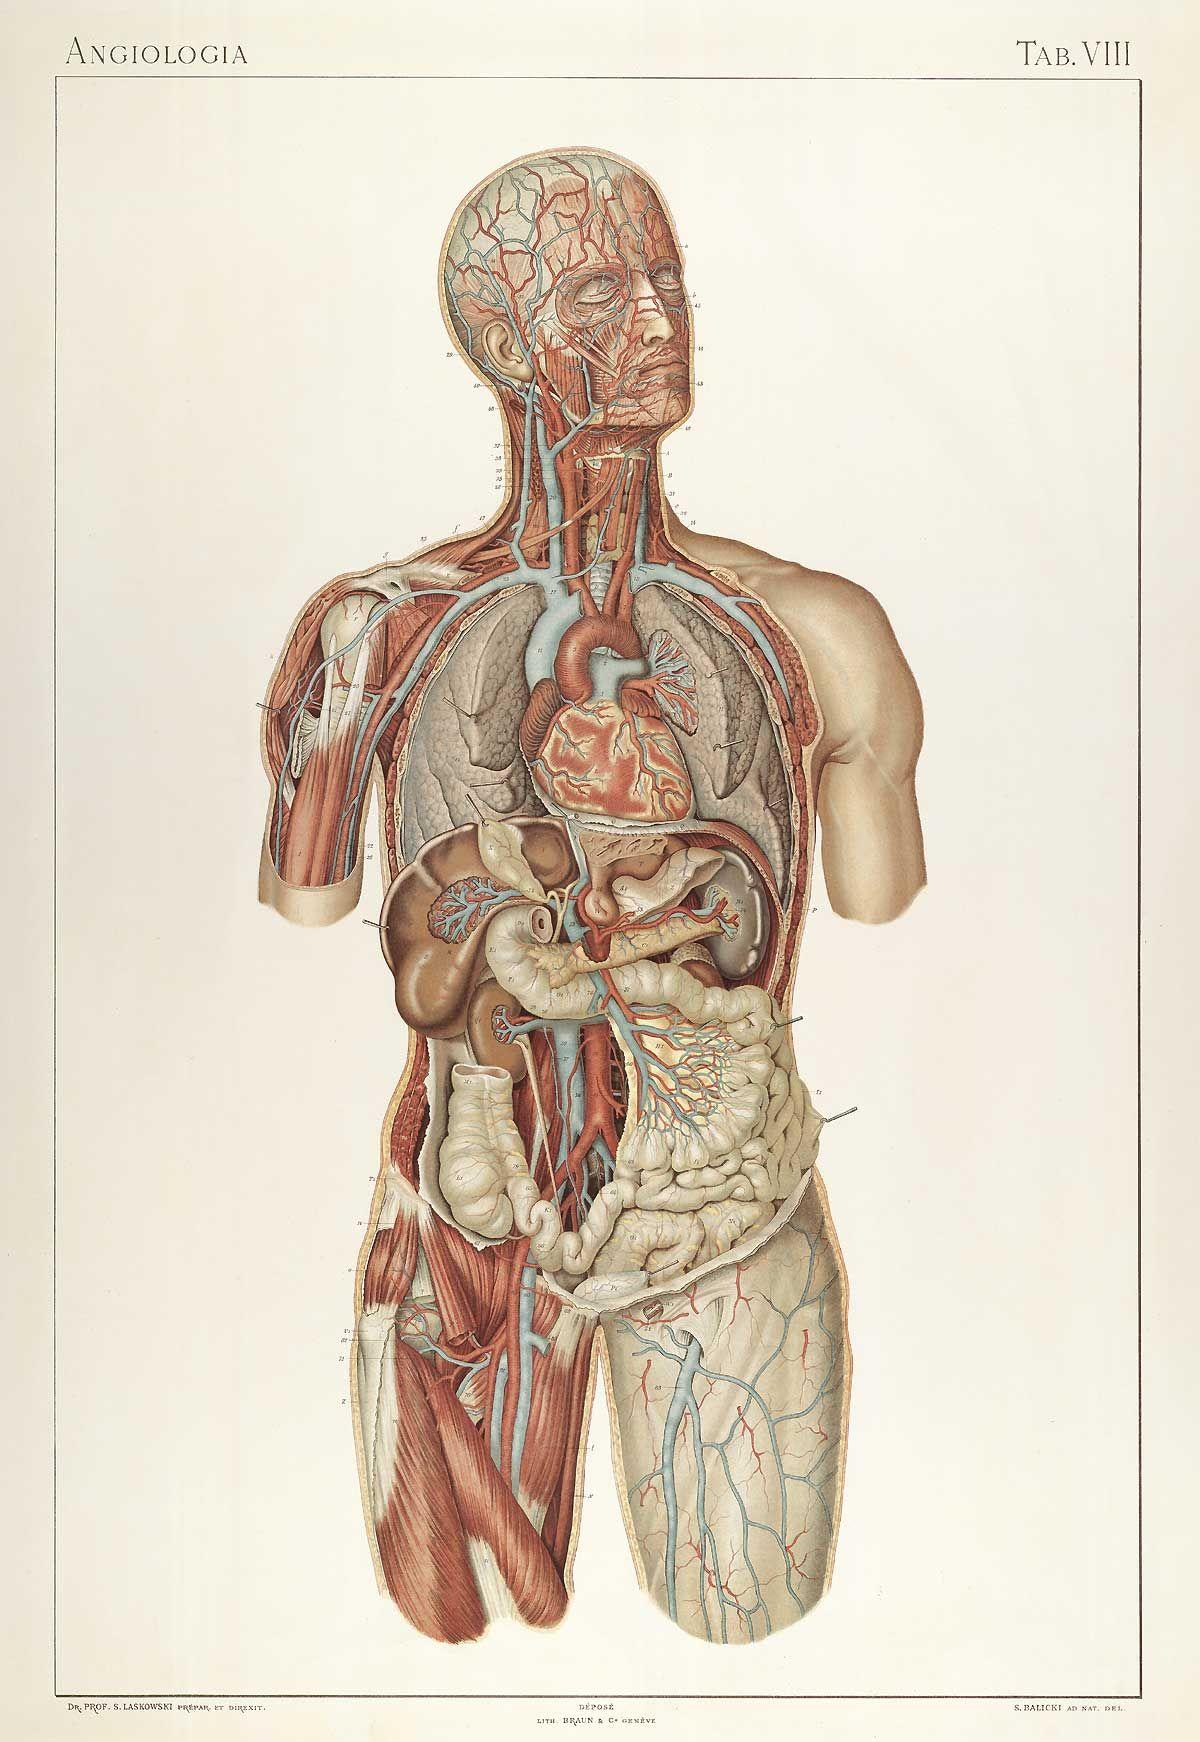 Sigismond Laskowski: Anatomie normale du corps humain: atlas ...